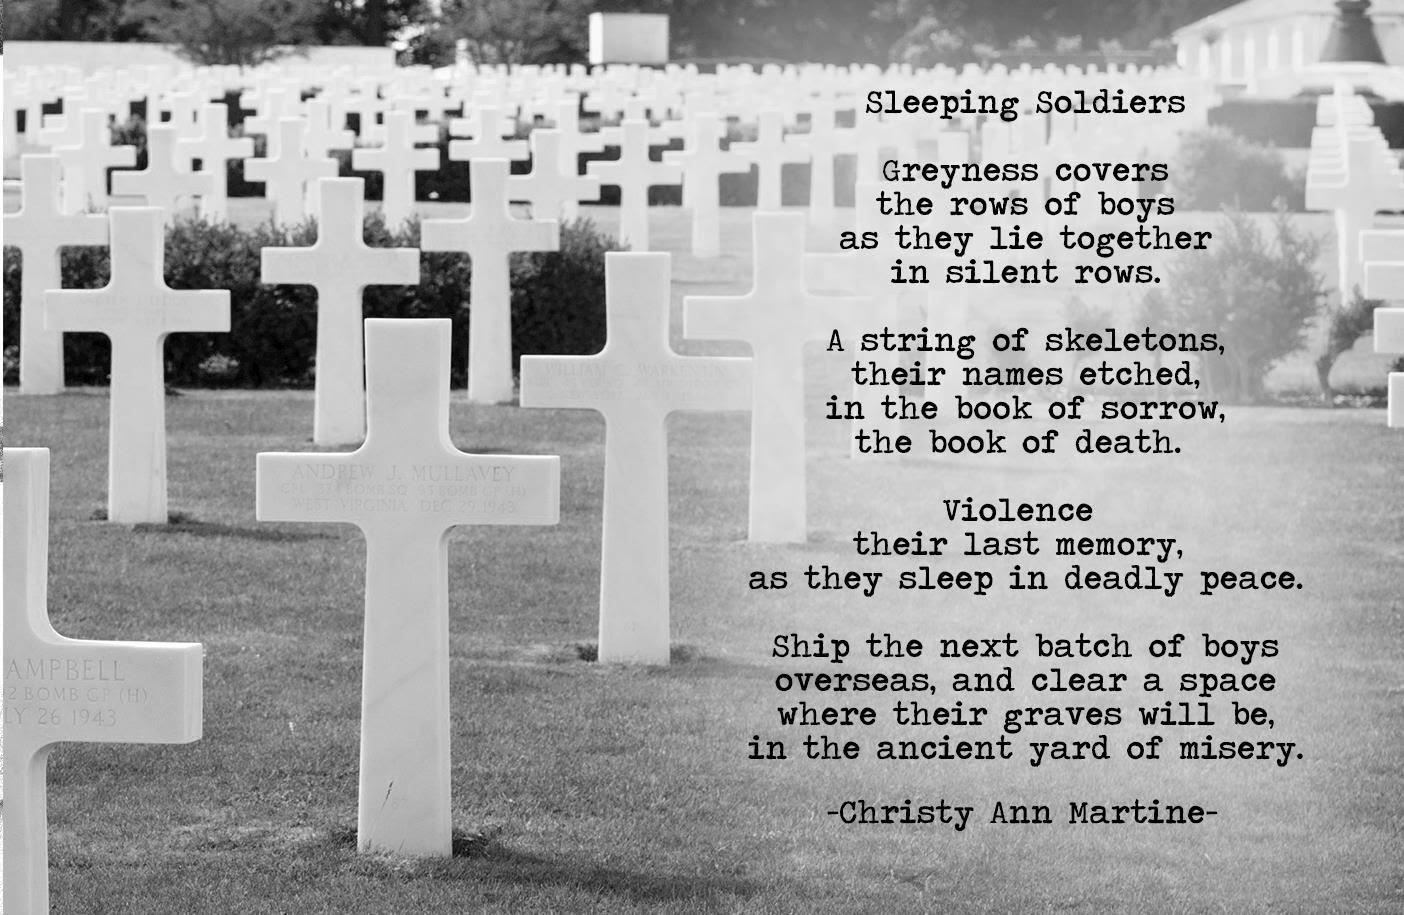 Christy Ann Martine: Sleeping Soldiers